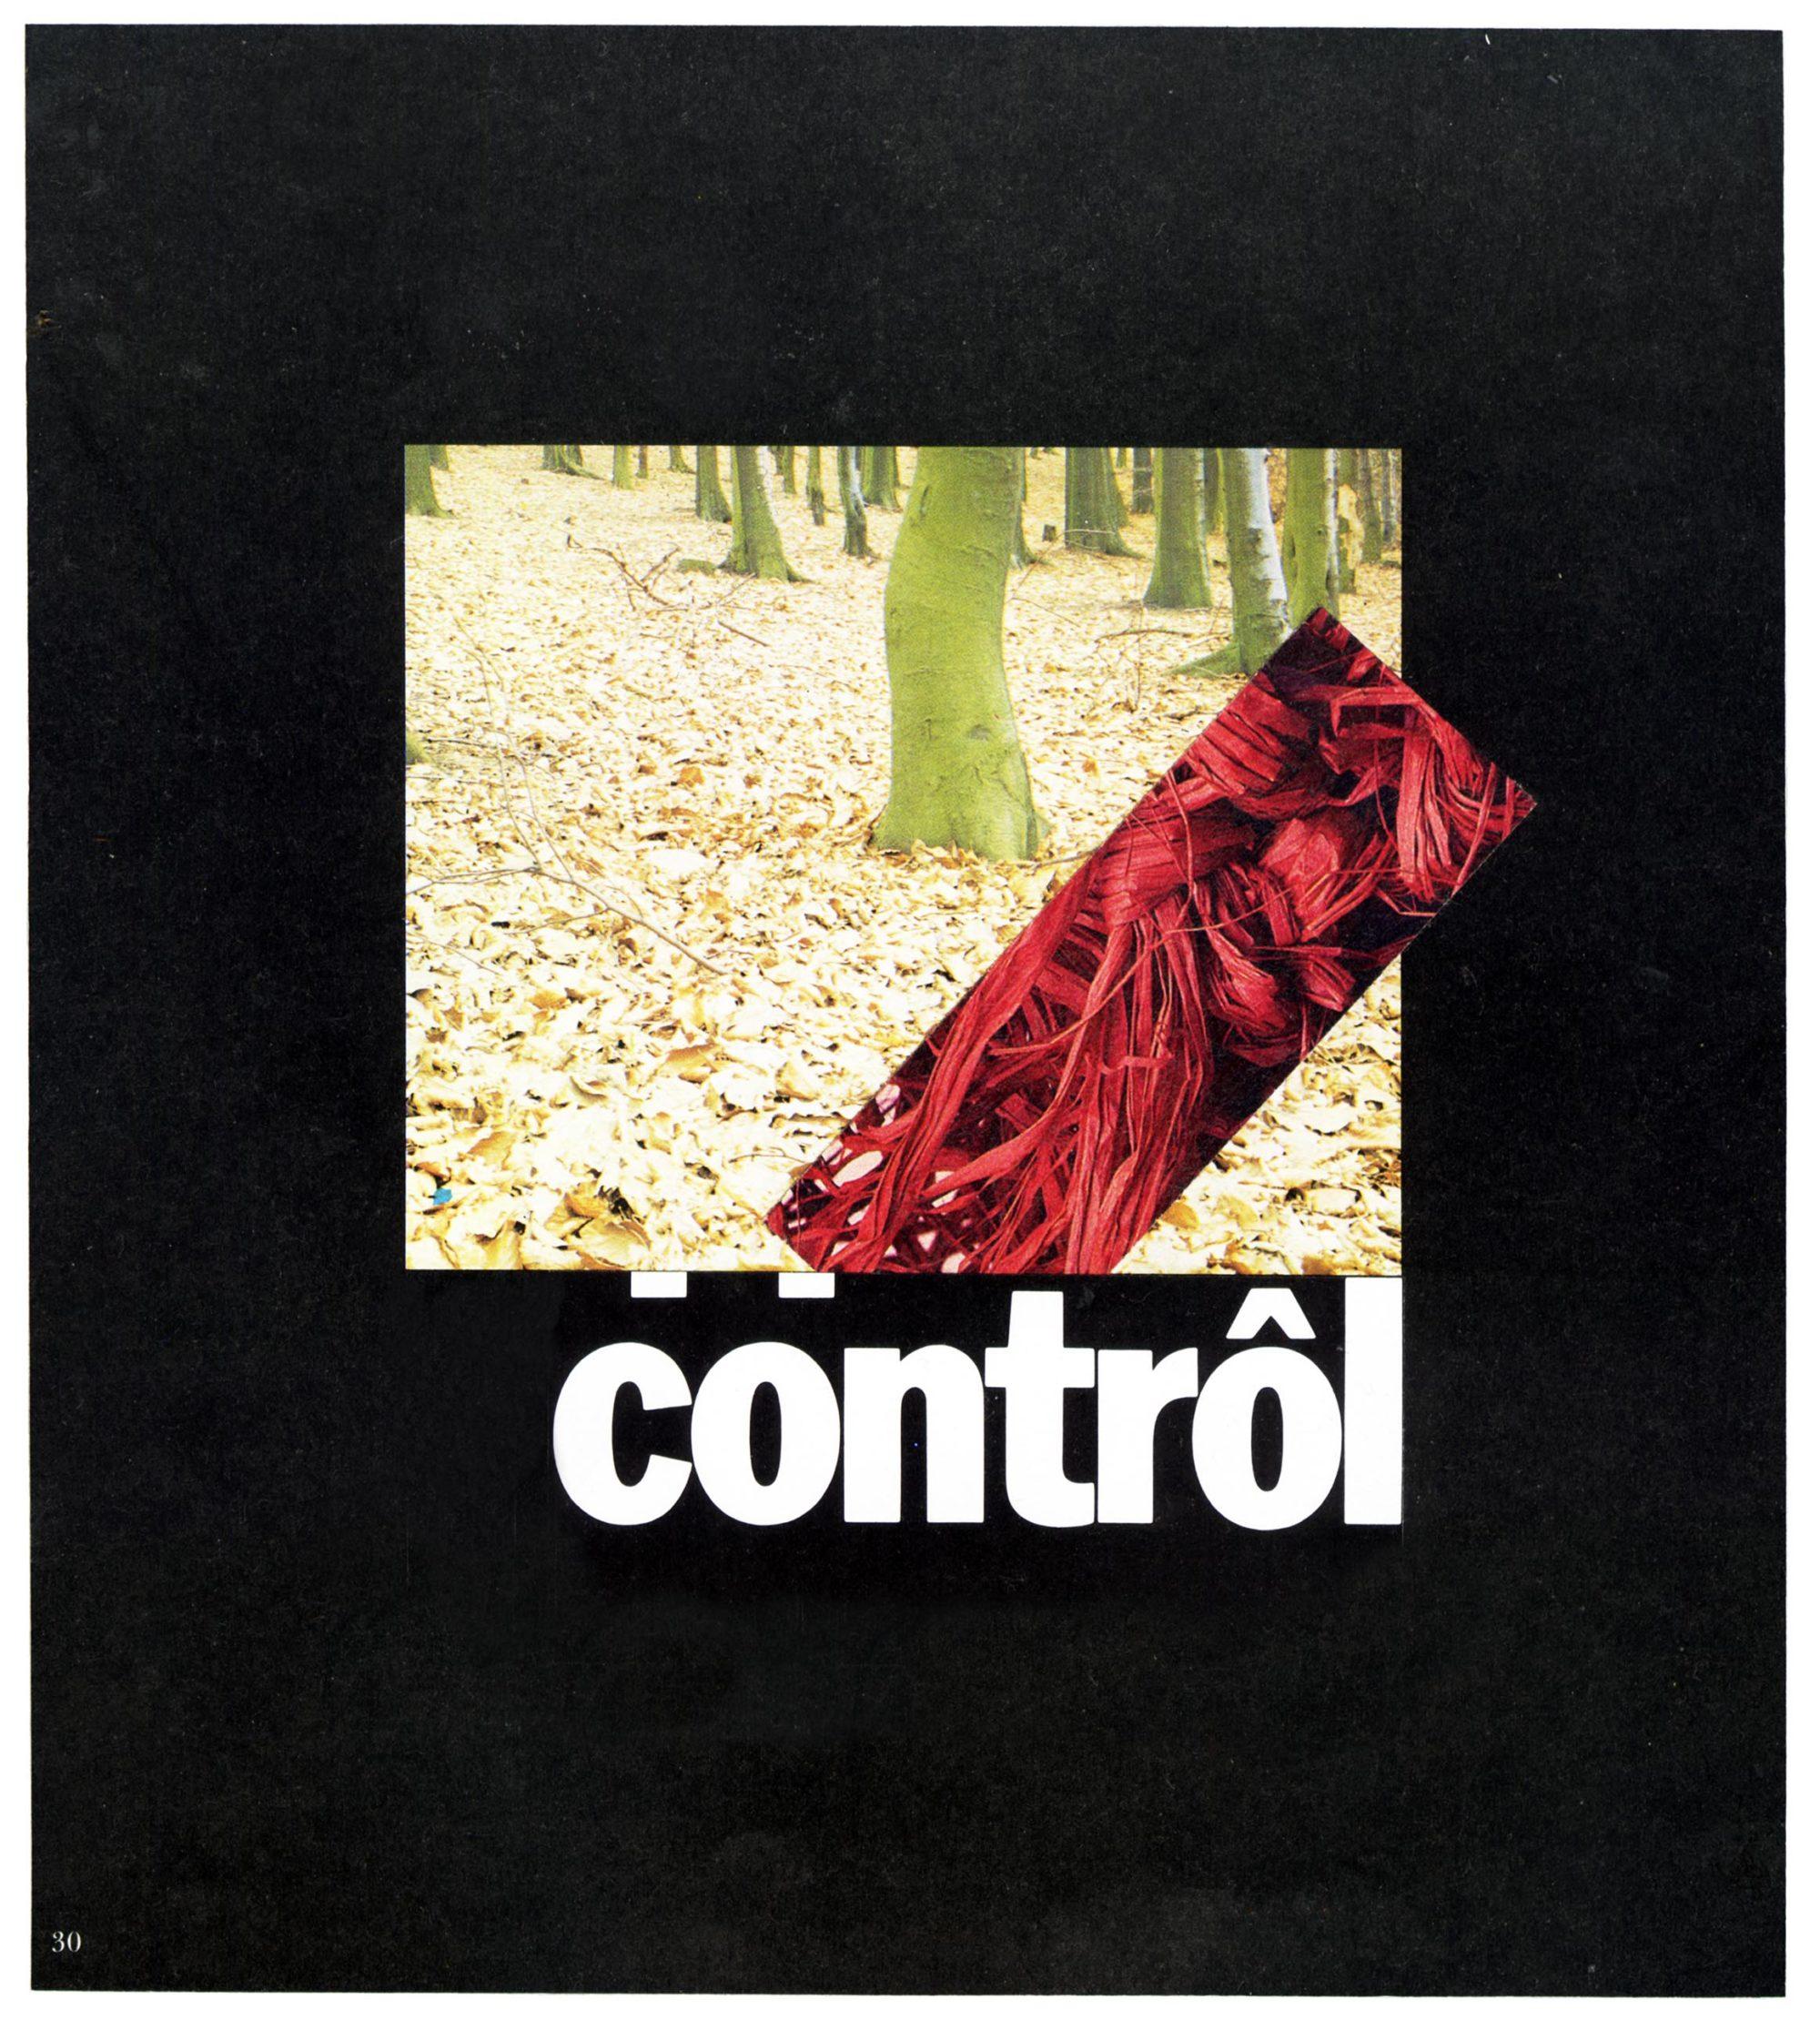 Control the image man